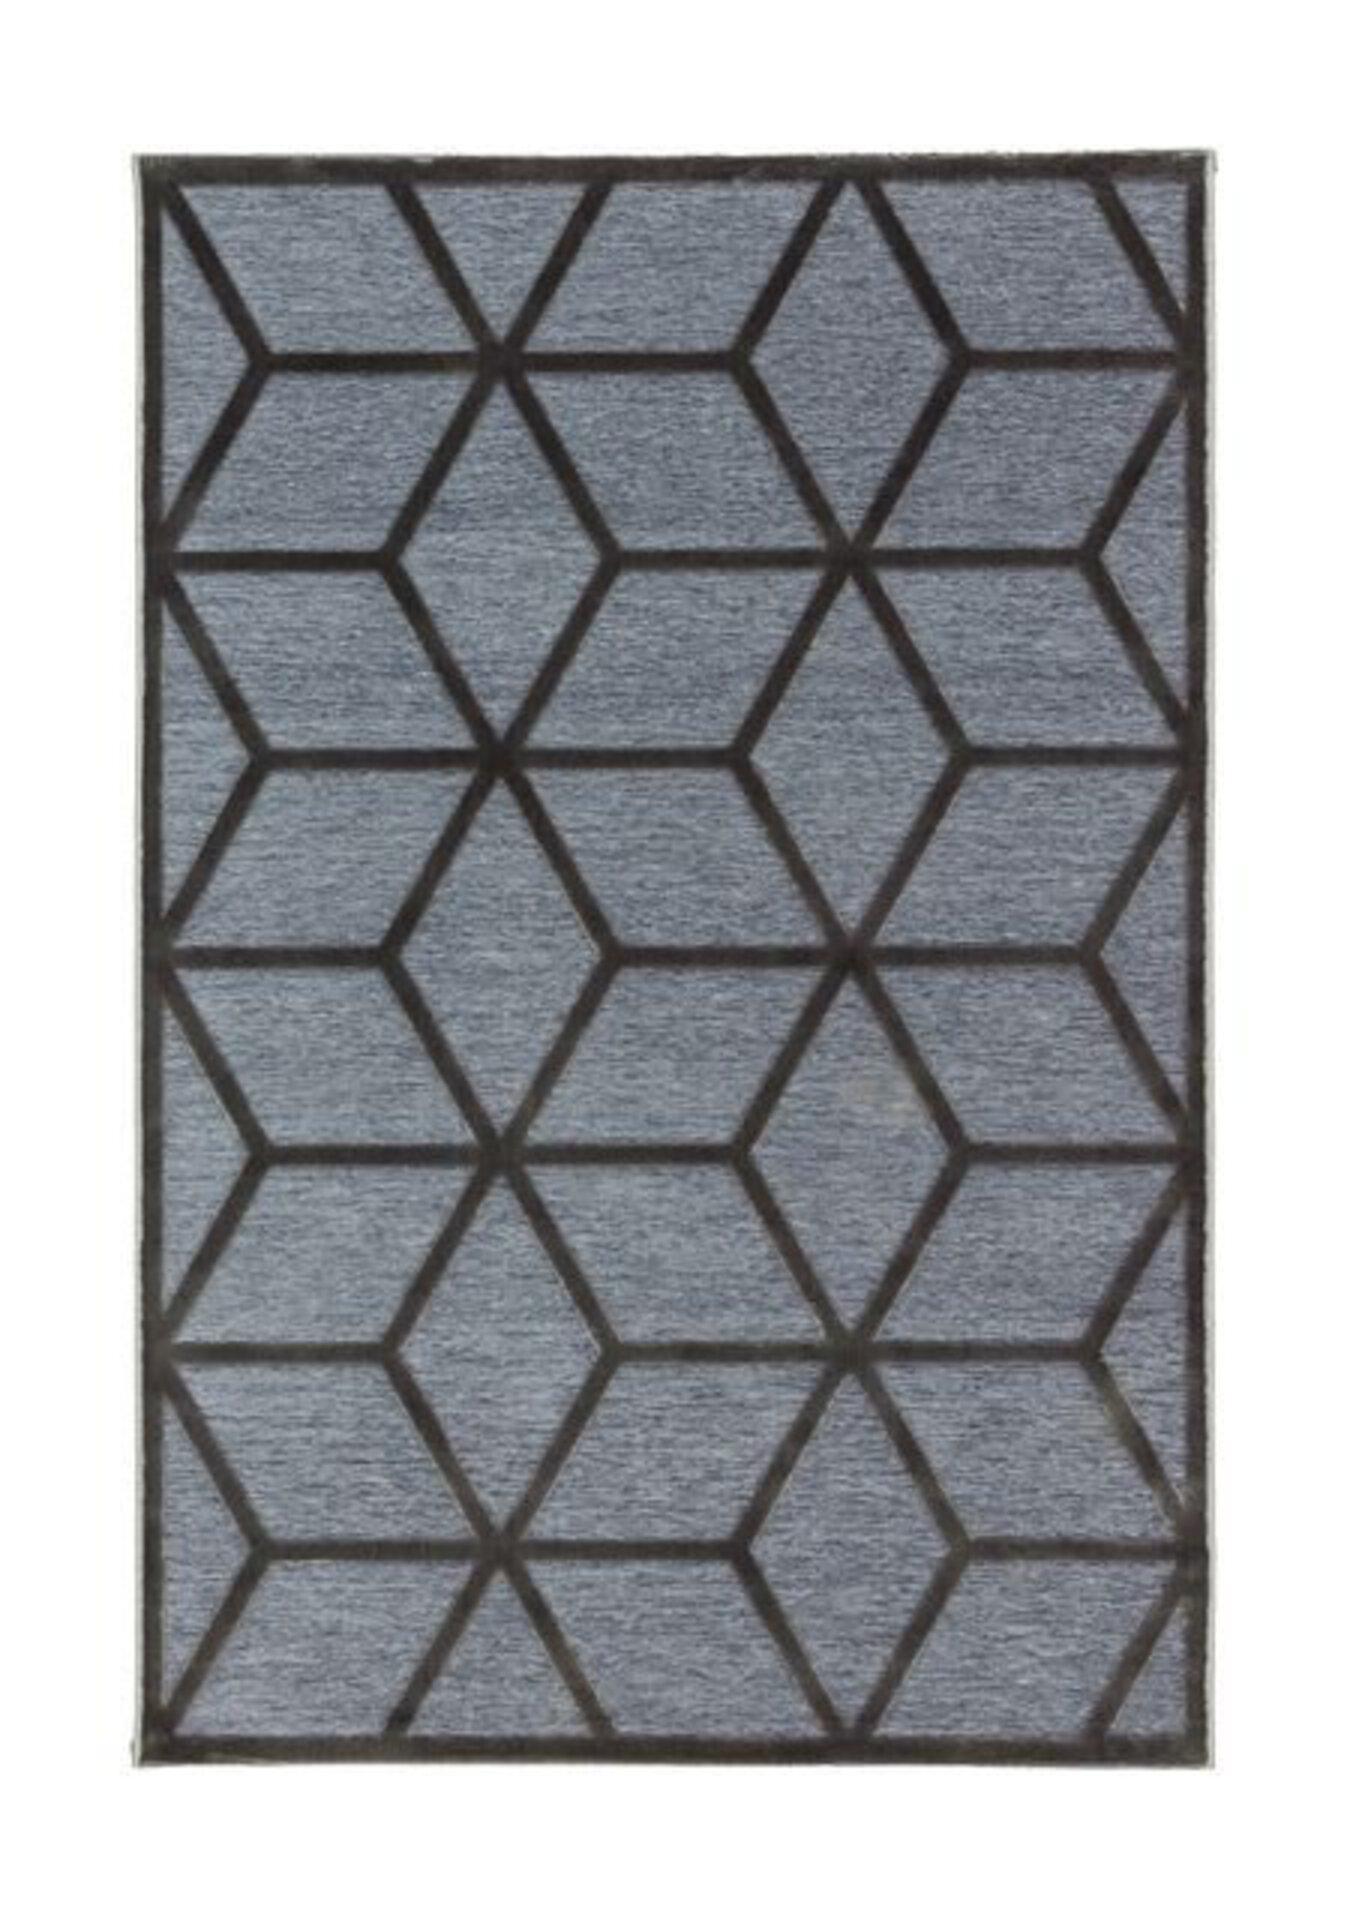 Maschinenwebteppich Graphic Joop! Textil grau 2 x 2 cm